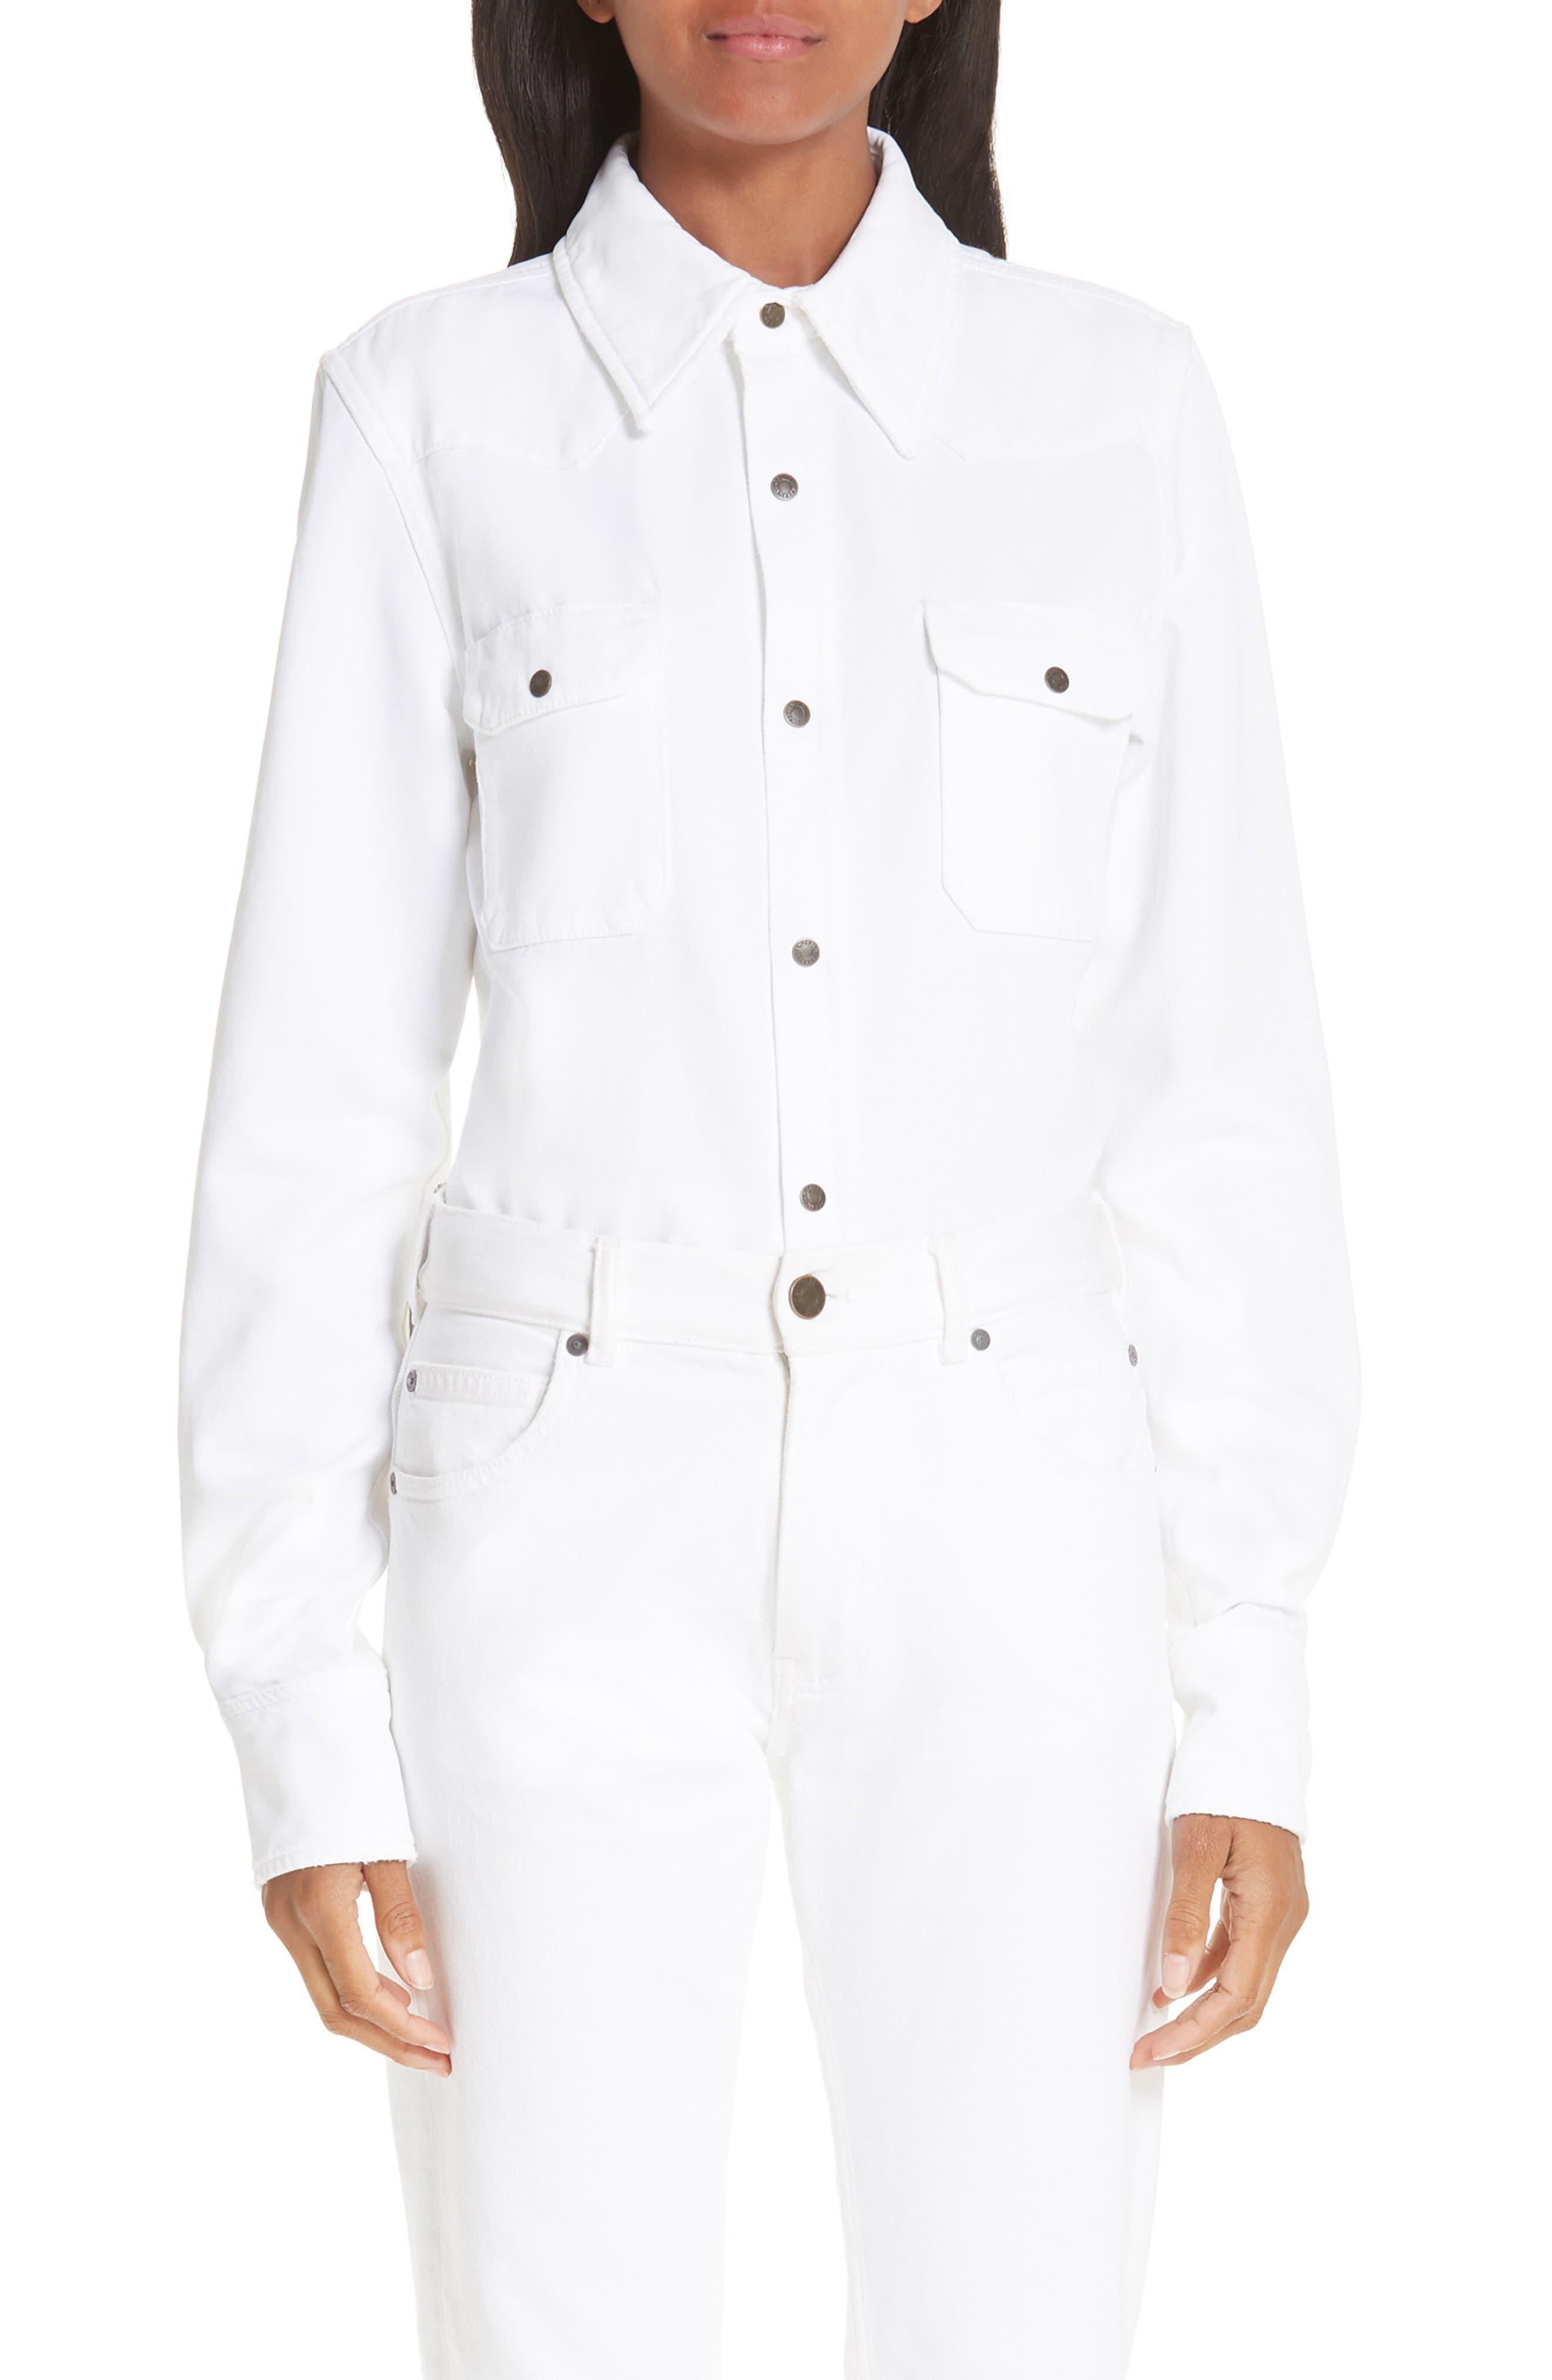 CALVIN KLEIN 205W39NYC Denim Shirt, Main, color, OPTIC WHITE